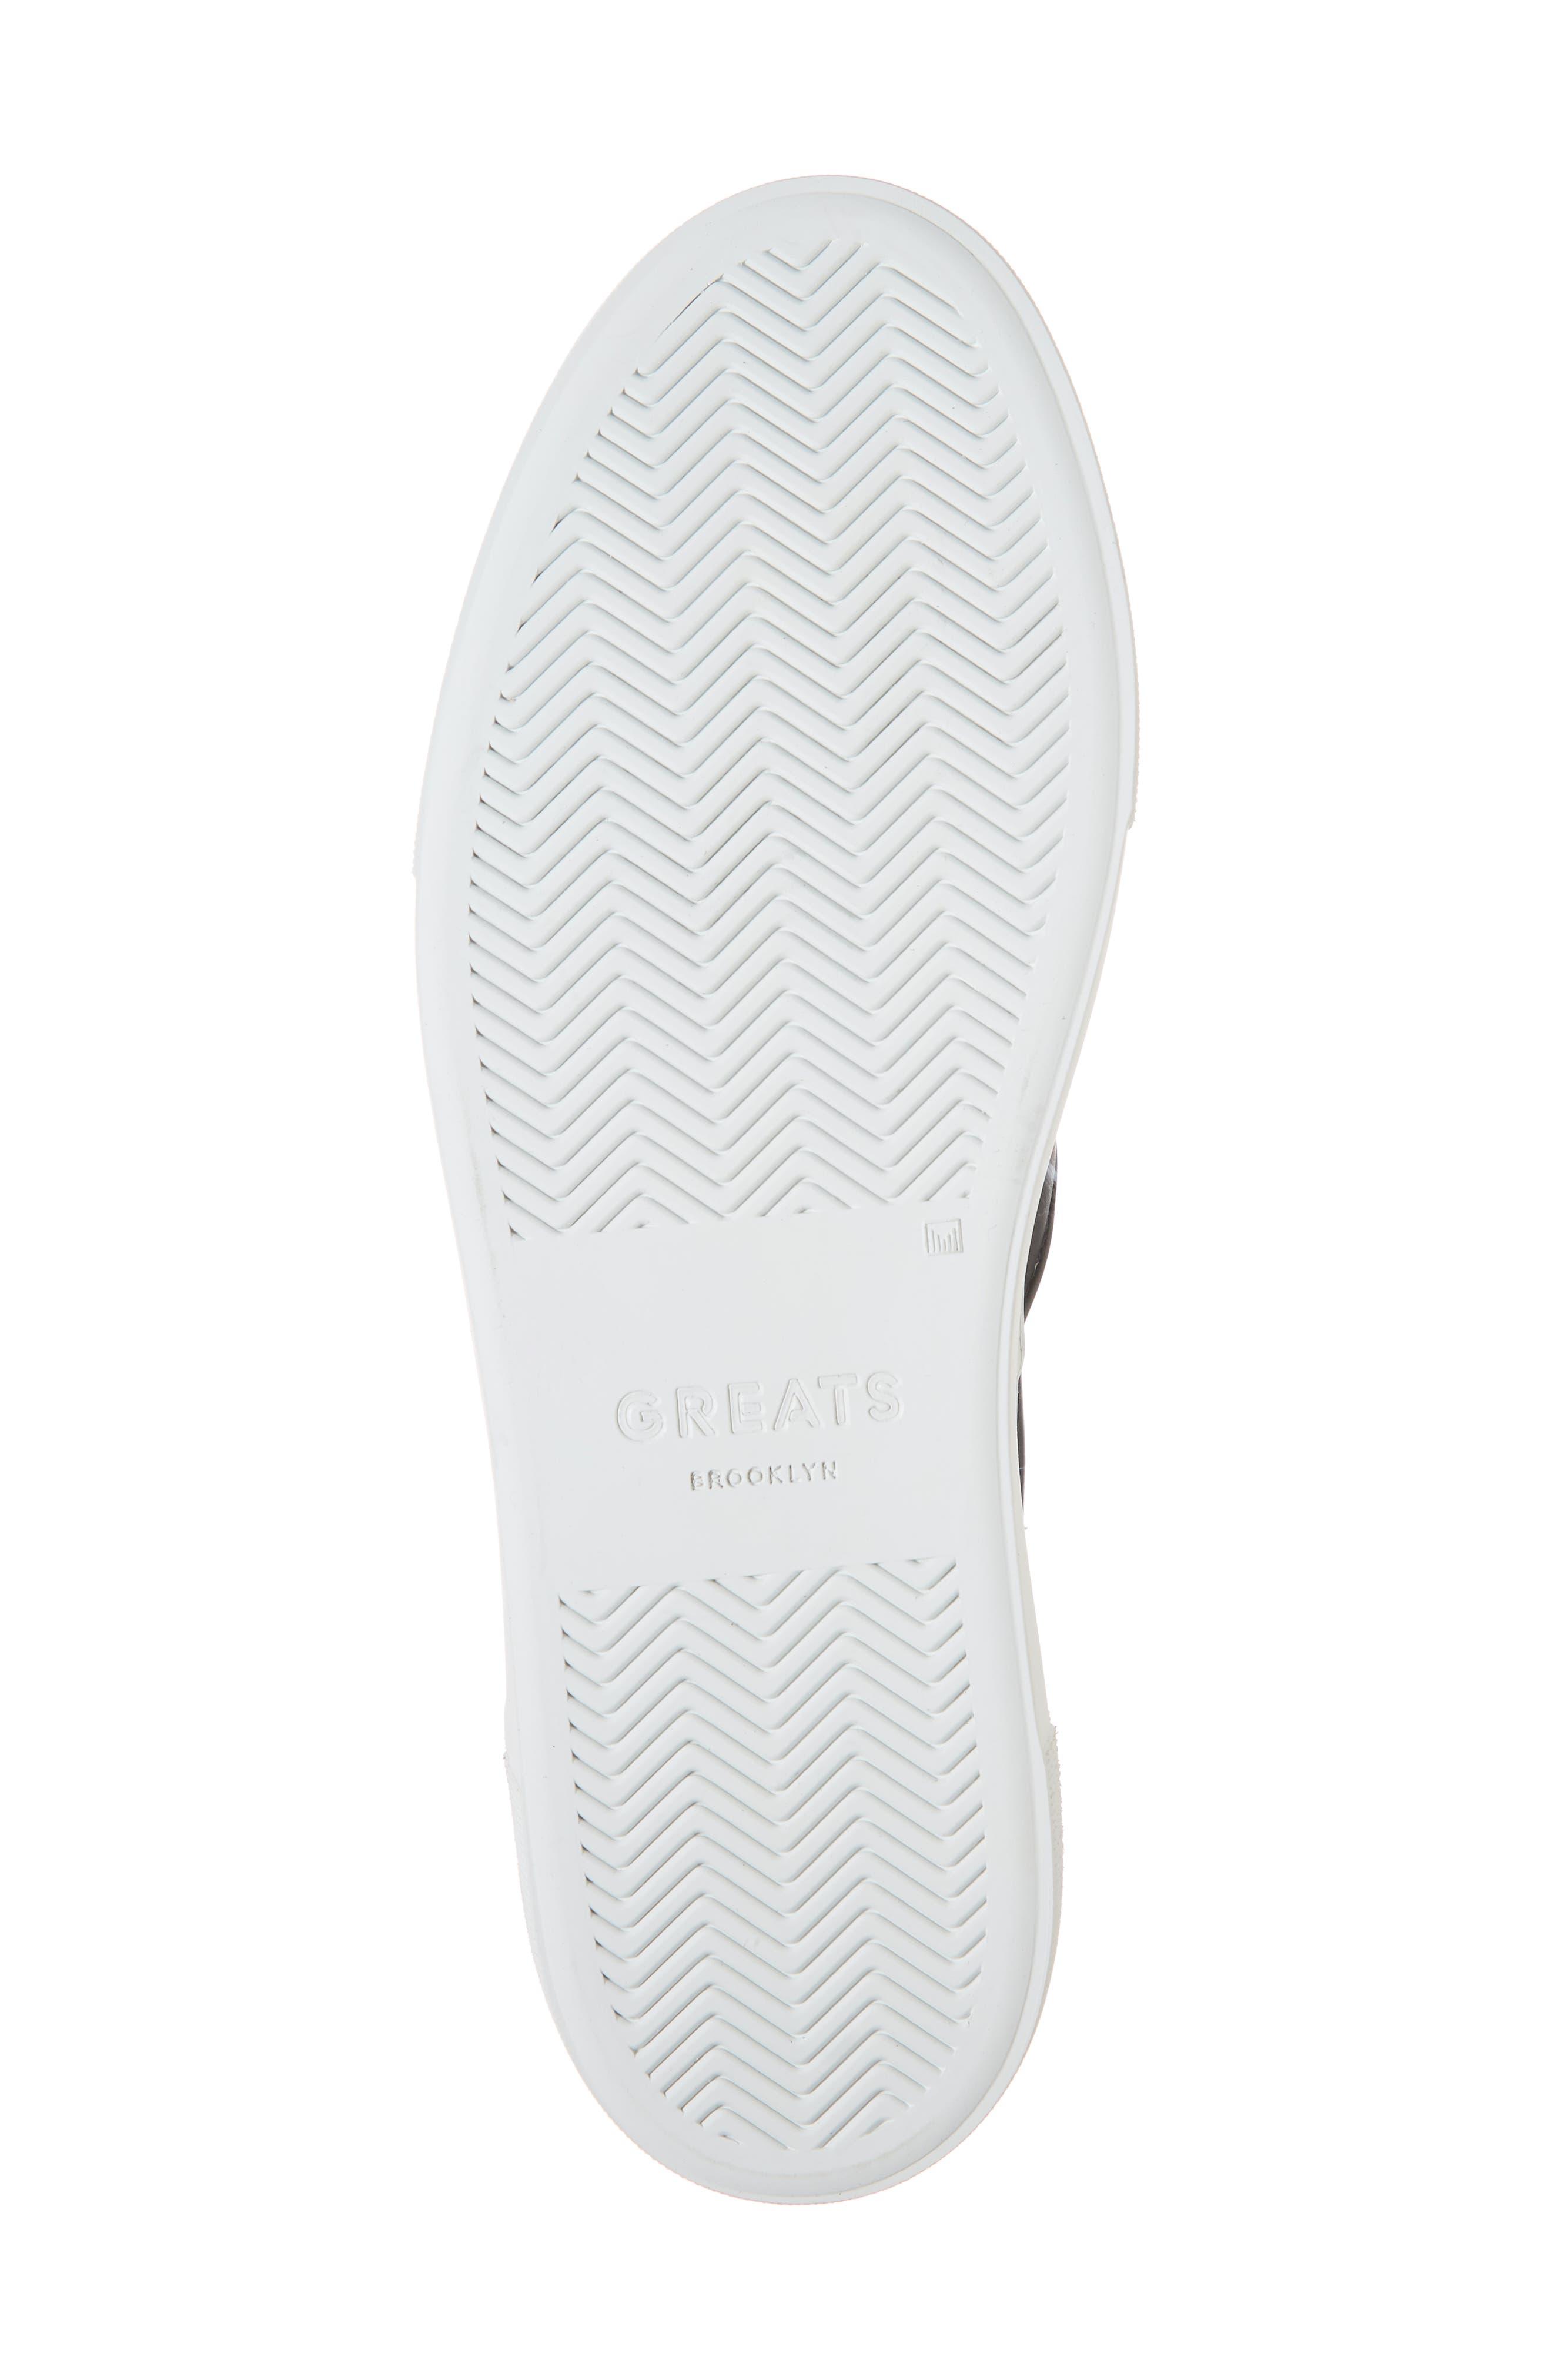 Nick Wooster x GREATS Slip-On Sneaker,                             Alternate thumbnail 6, color,                             BLACK W/ 3M DOTS